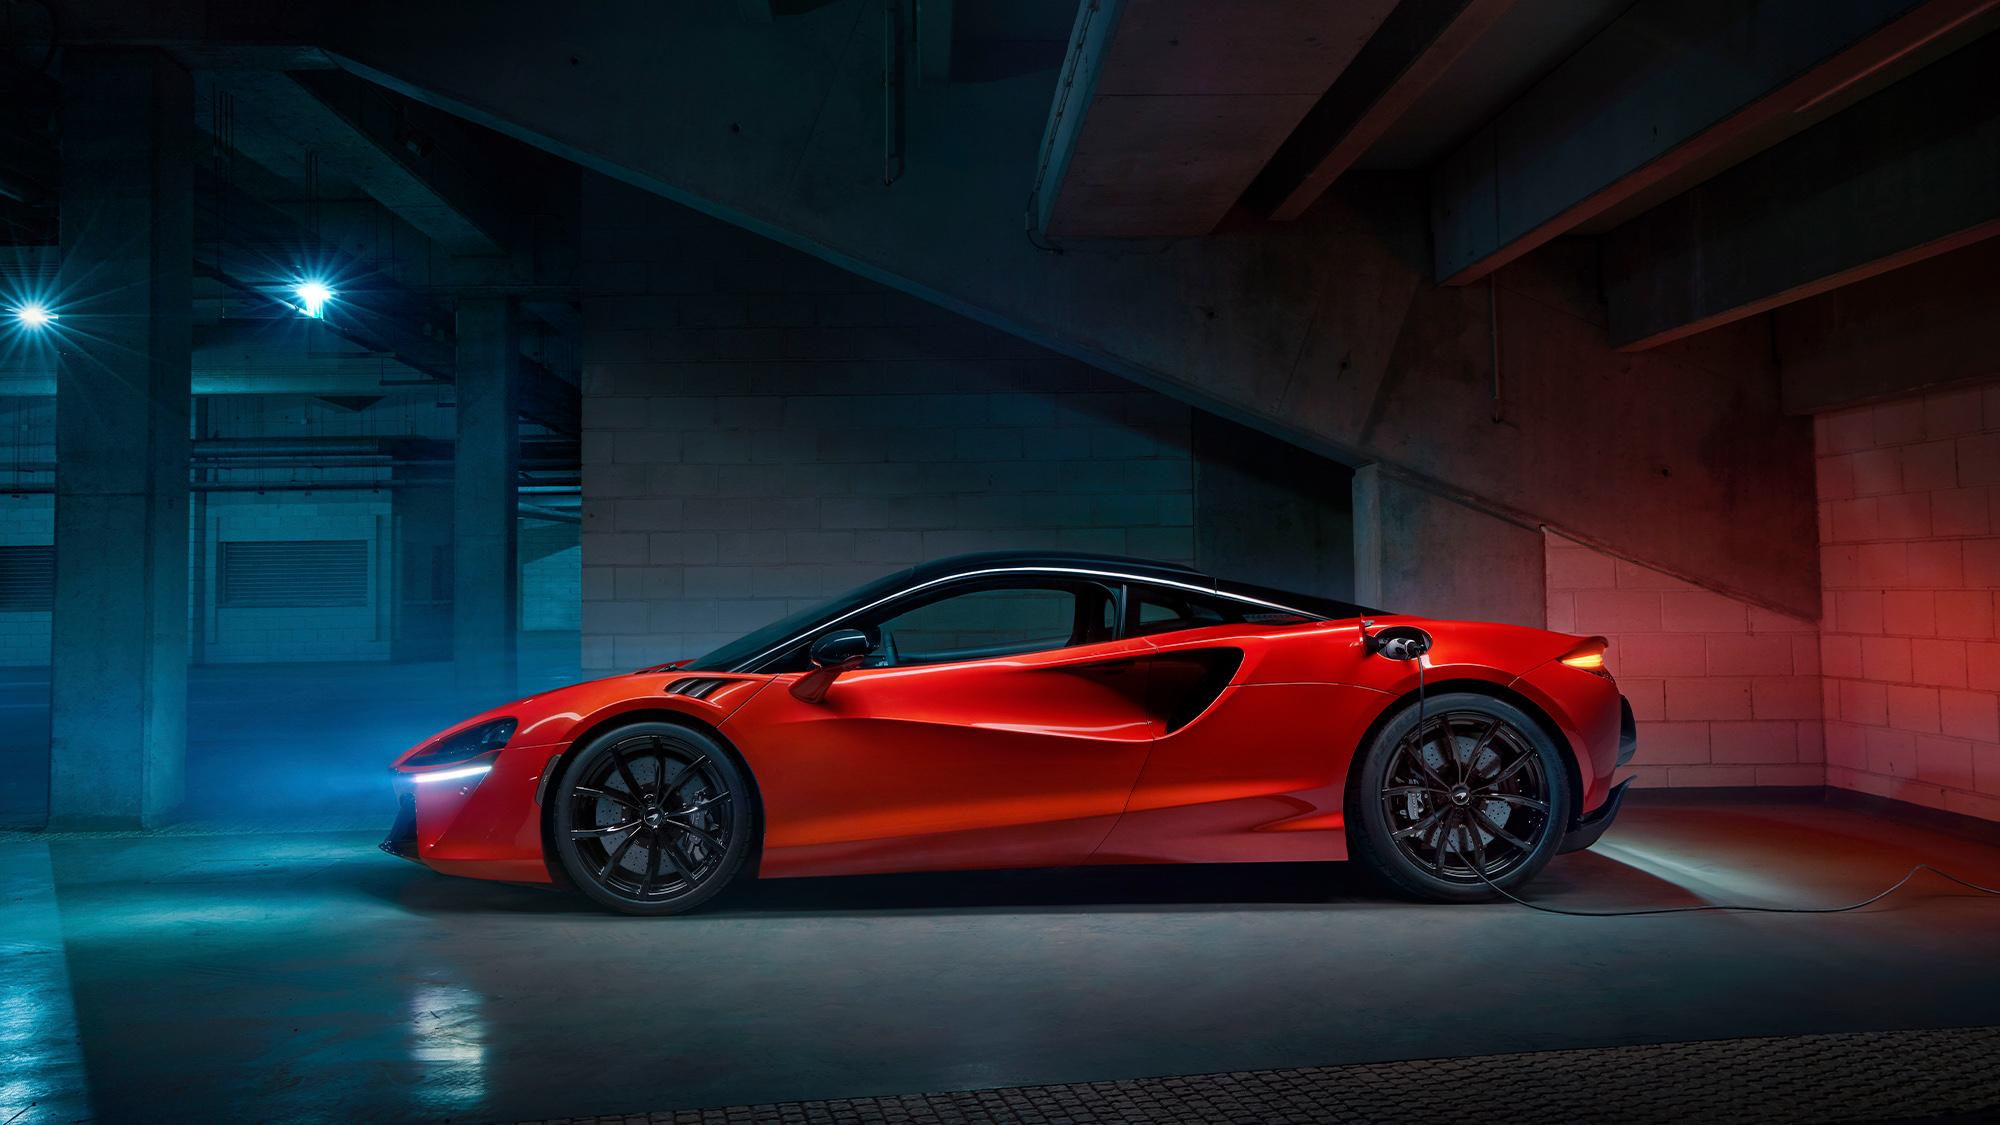 2021 McLaren Artura side